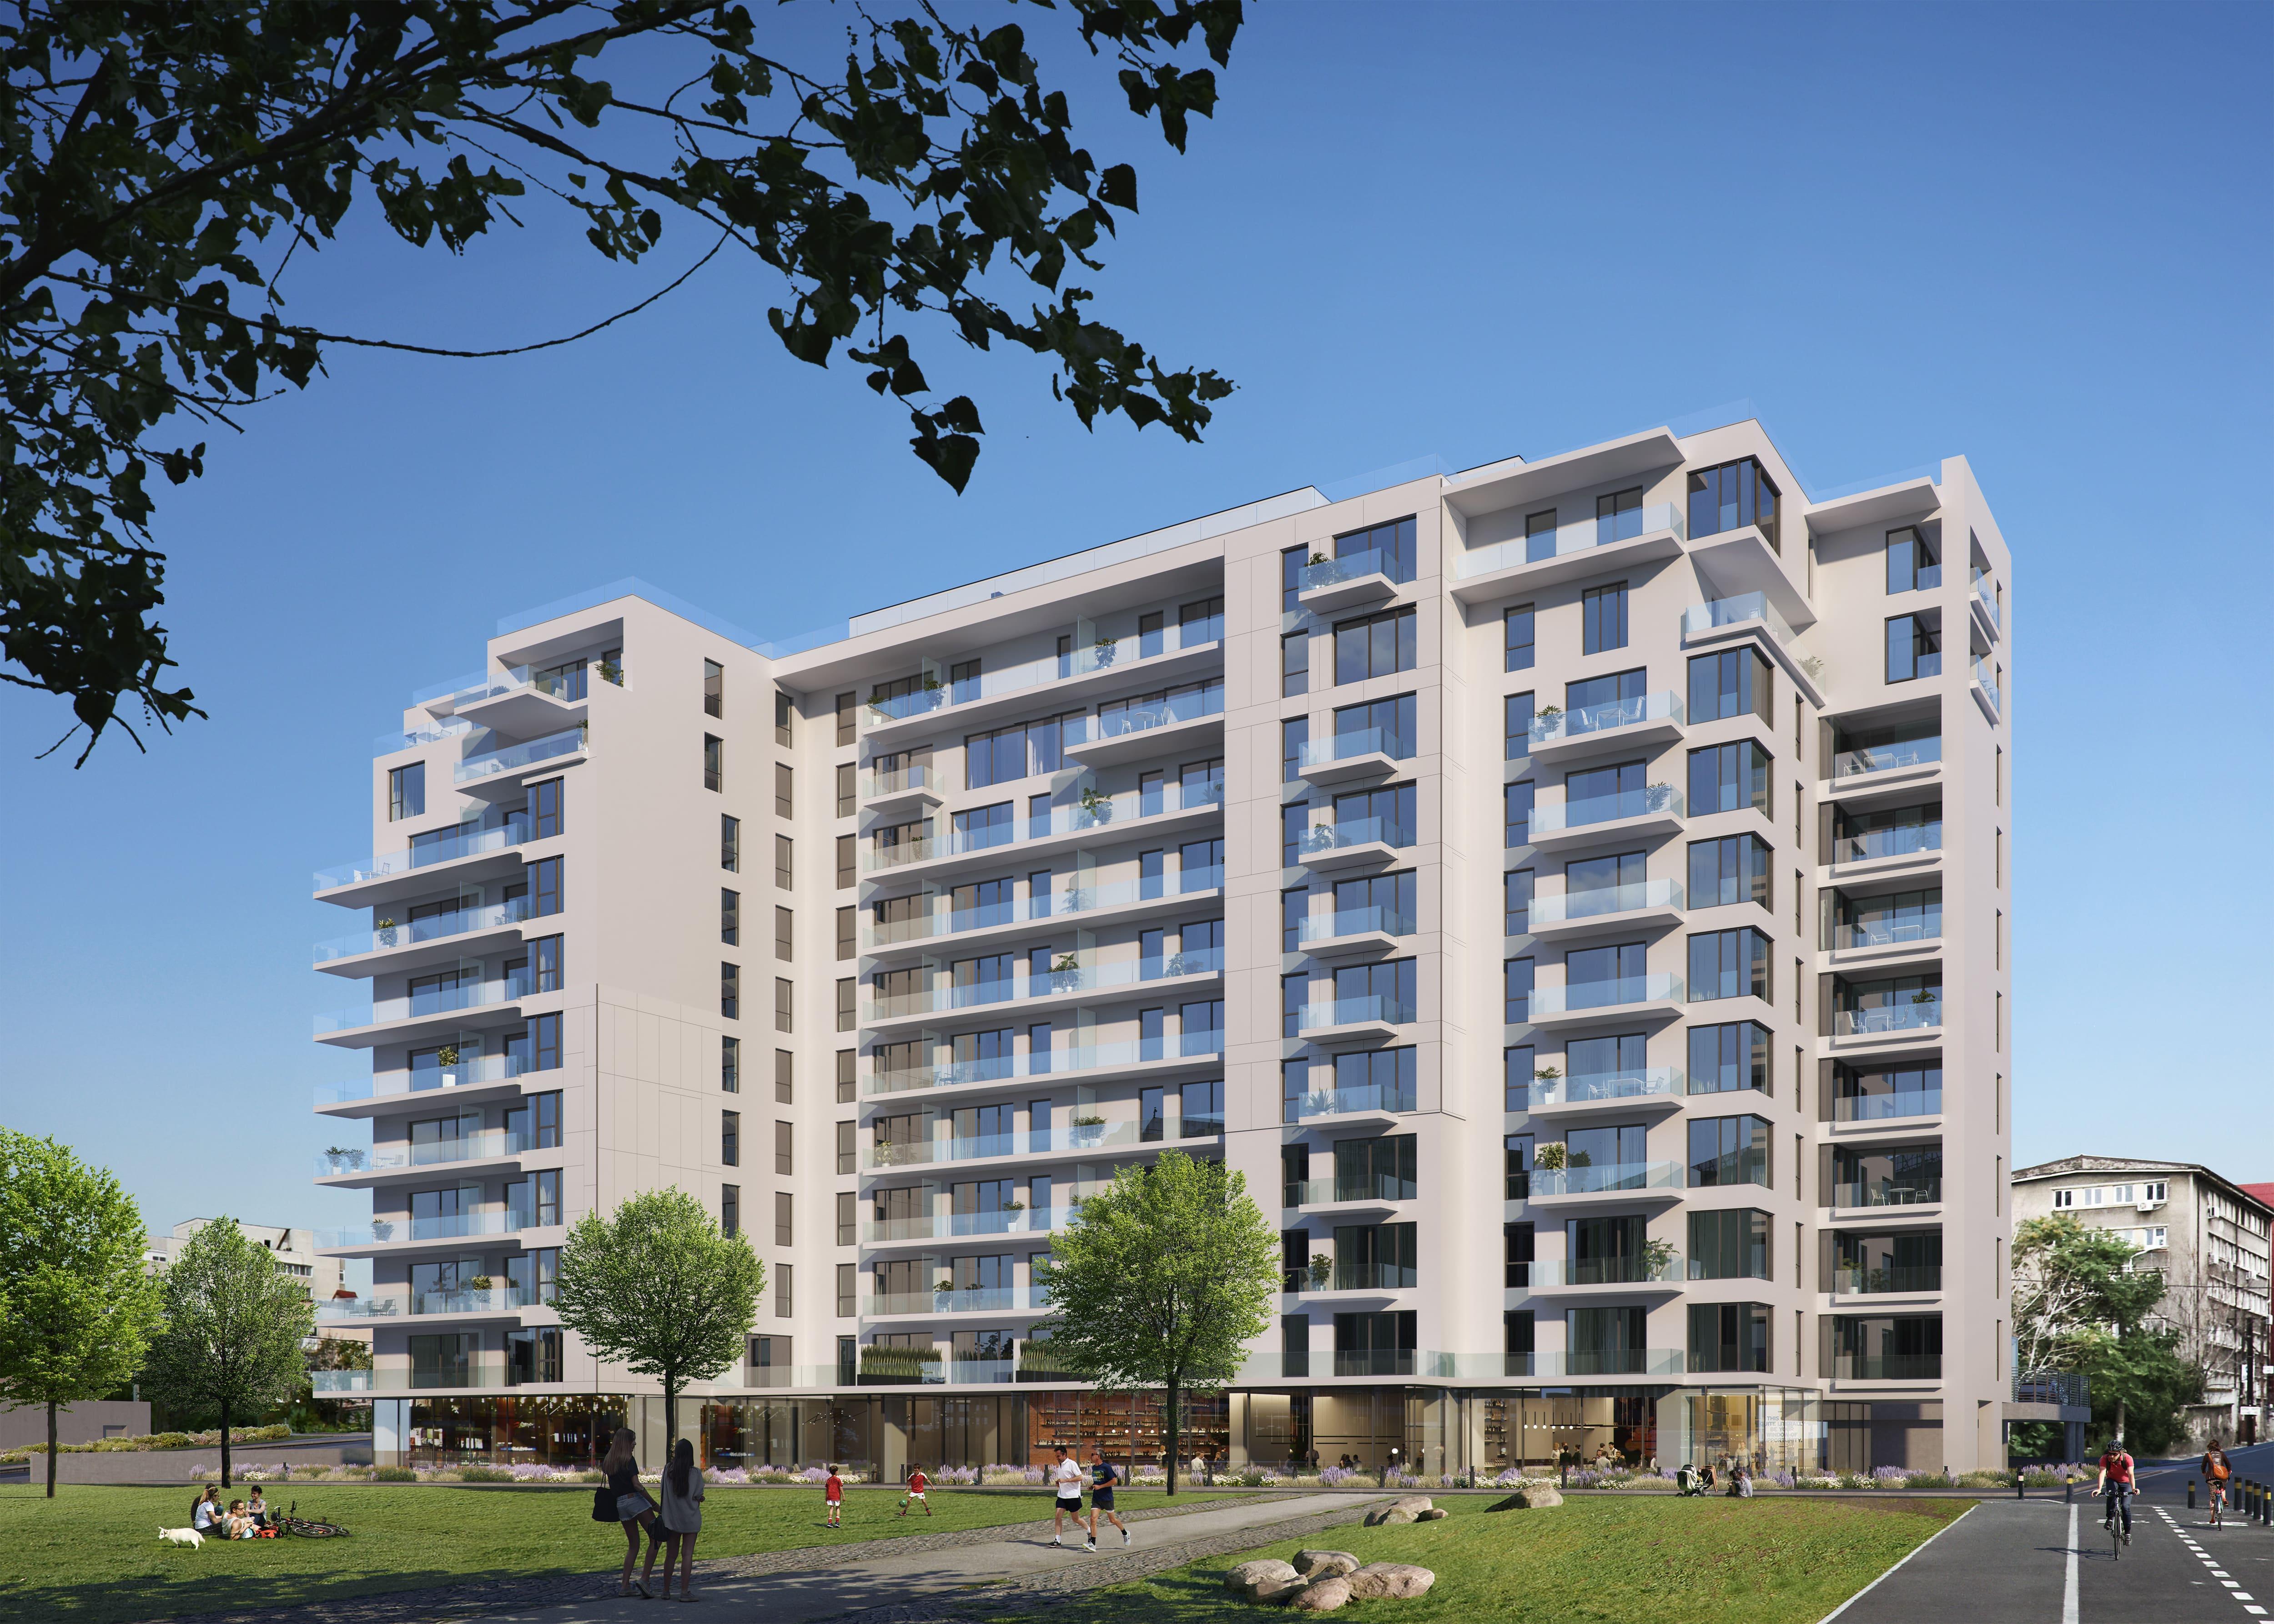 https://ahe-ro.s3.amazonaws.com/8248/penthouse-si-apartamente-unirii-%287%29.jpg